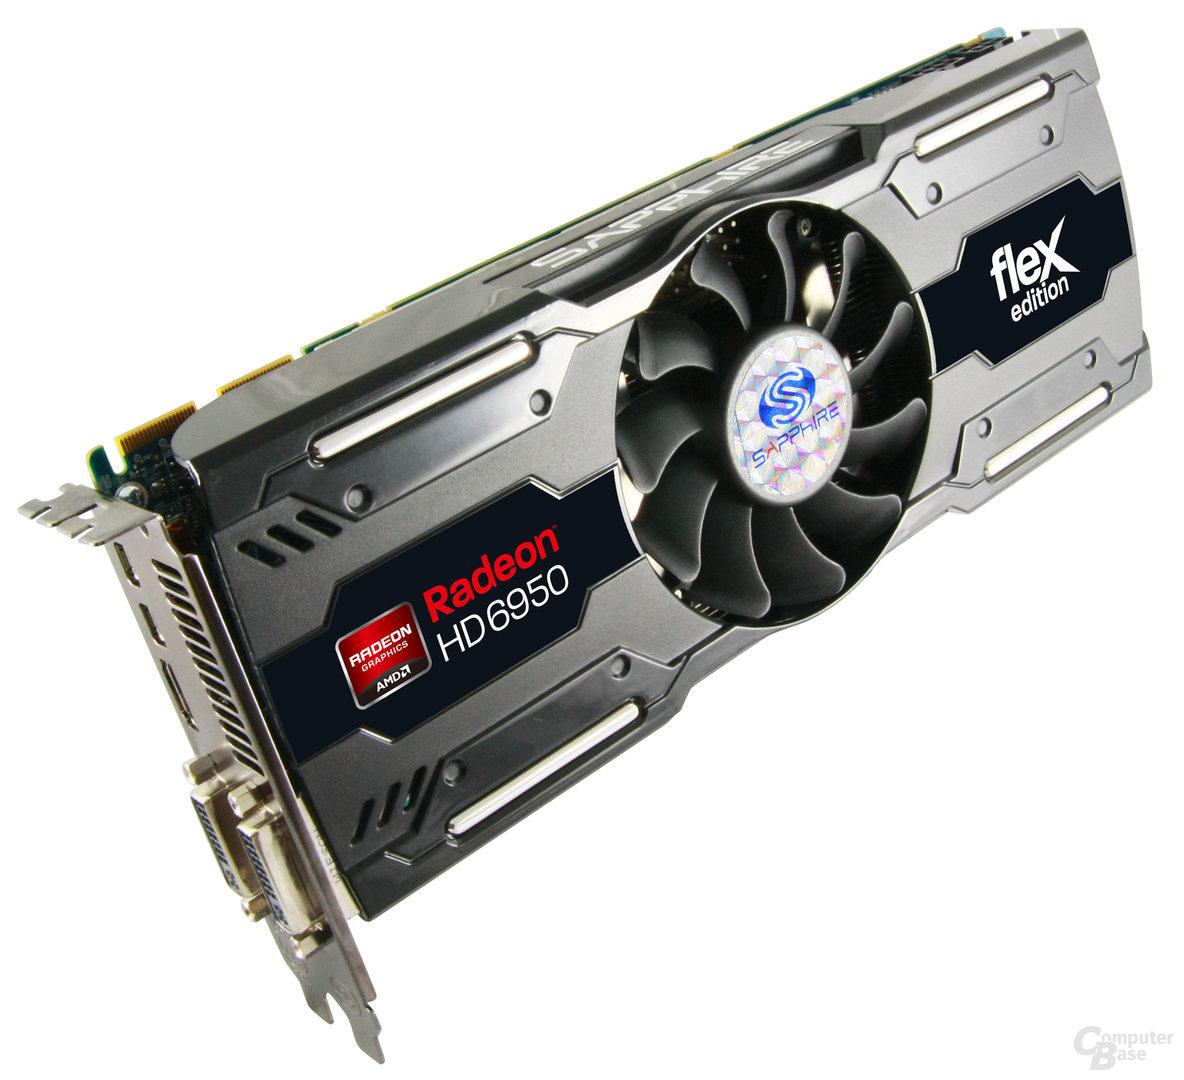 Sapphire Radeon HD 6950 FleX